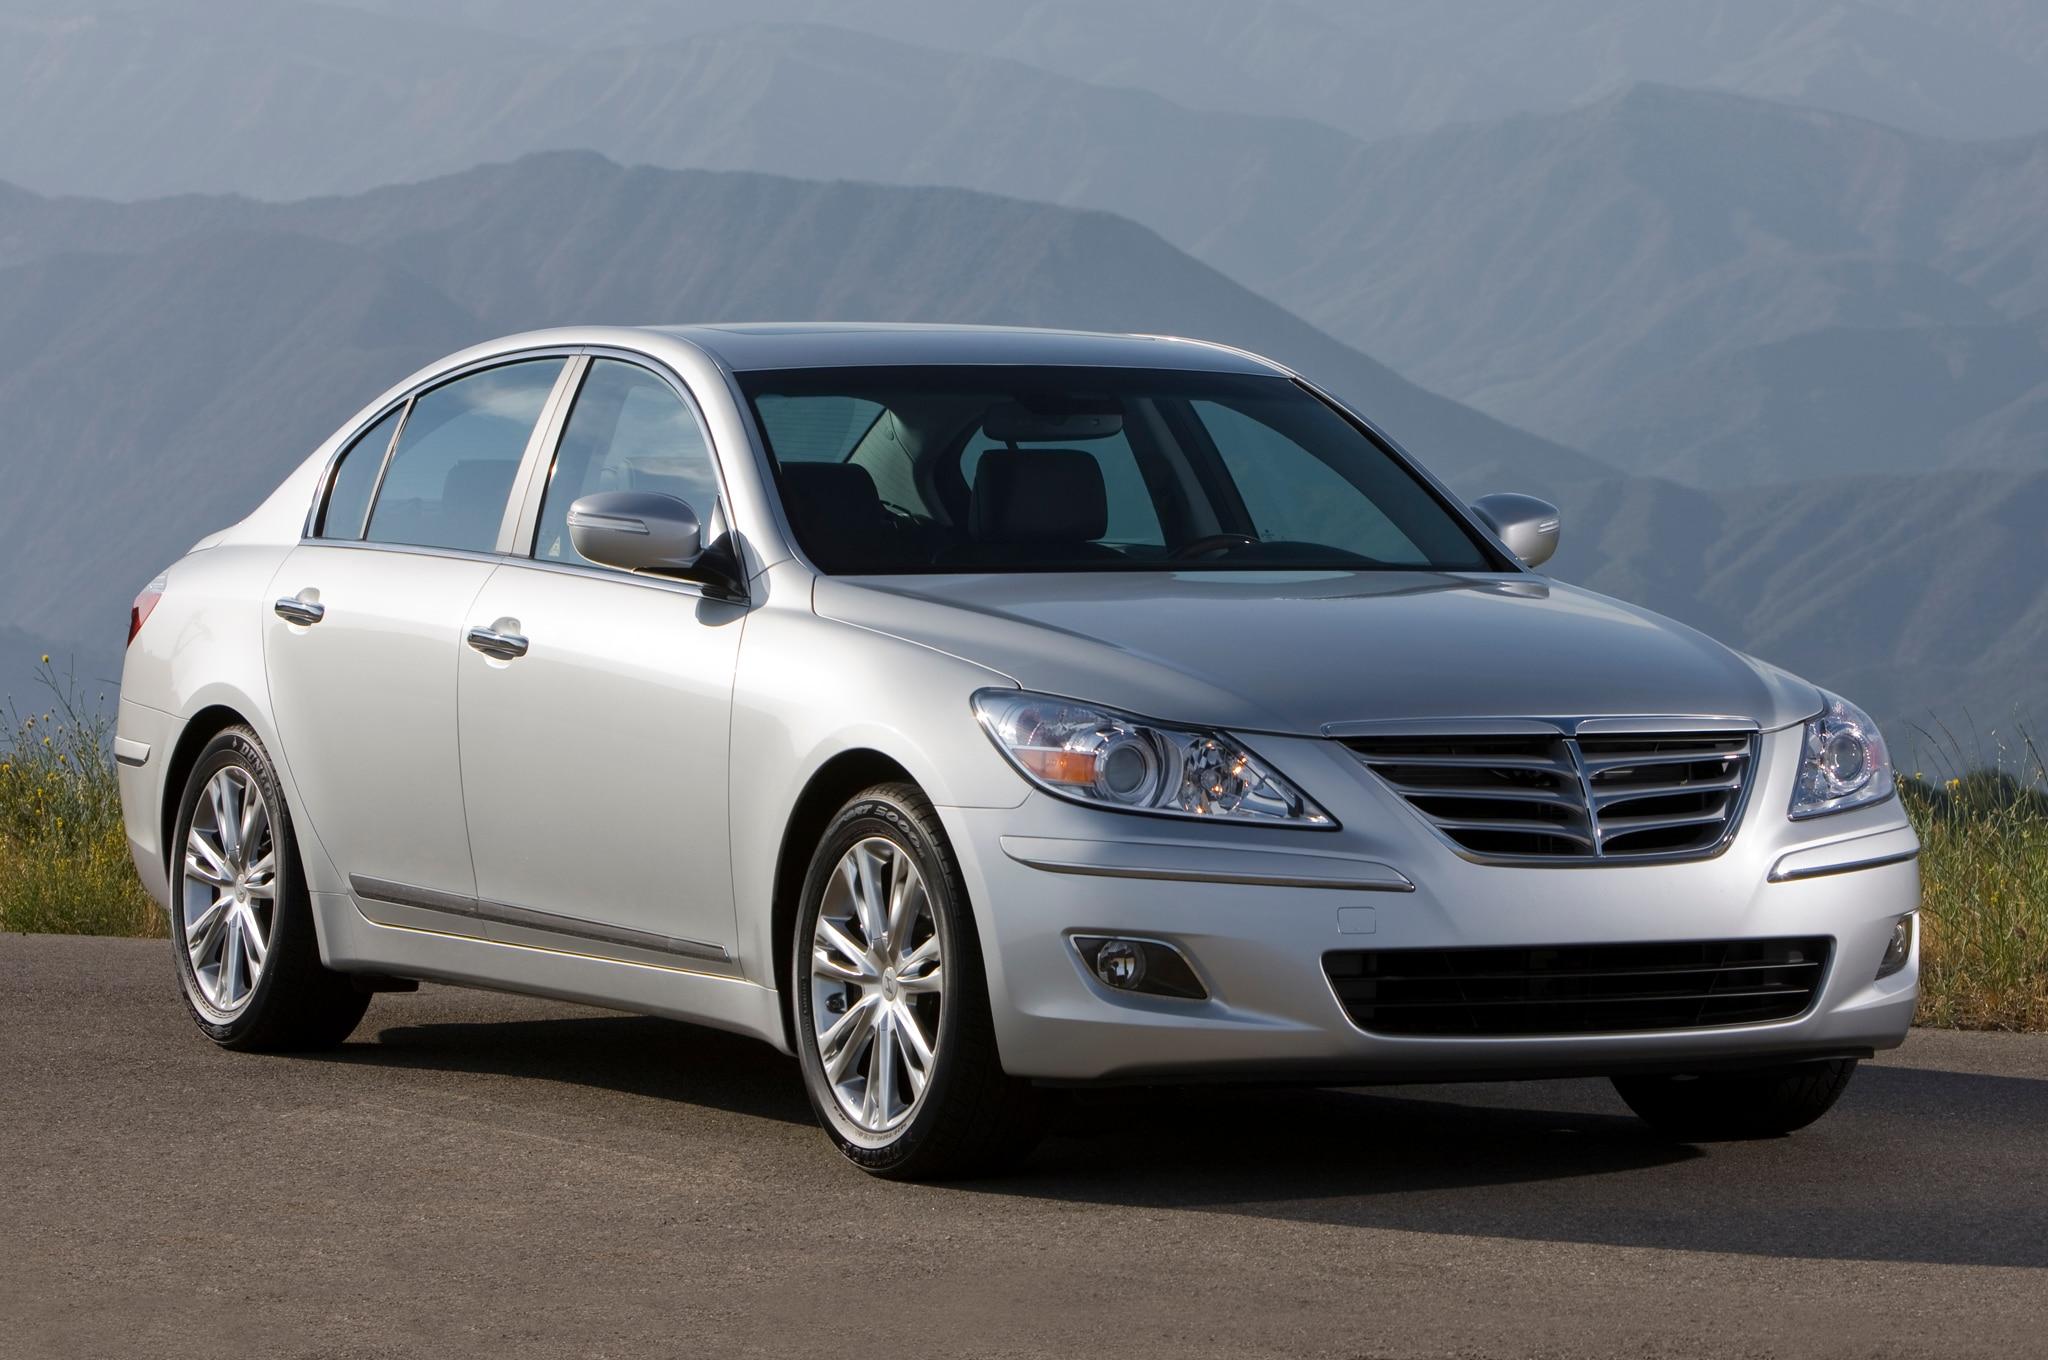 2011 Hyundai Genesis Sedan Front Three Quarters1